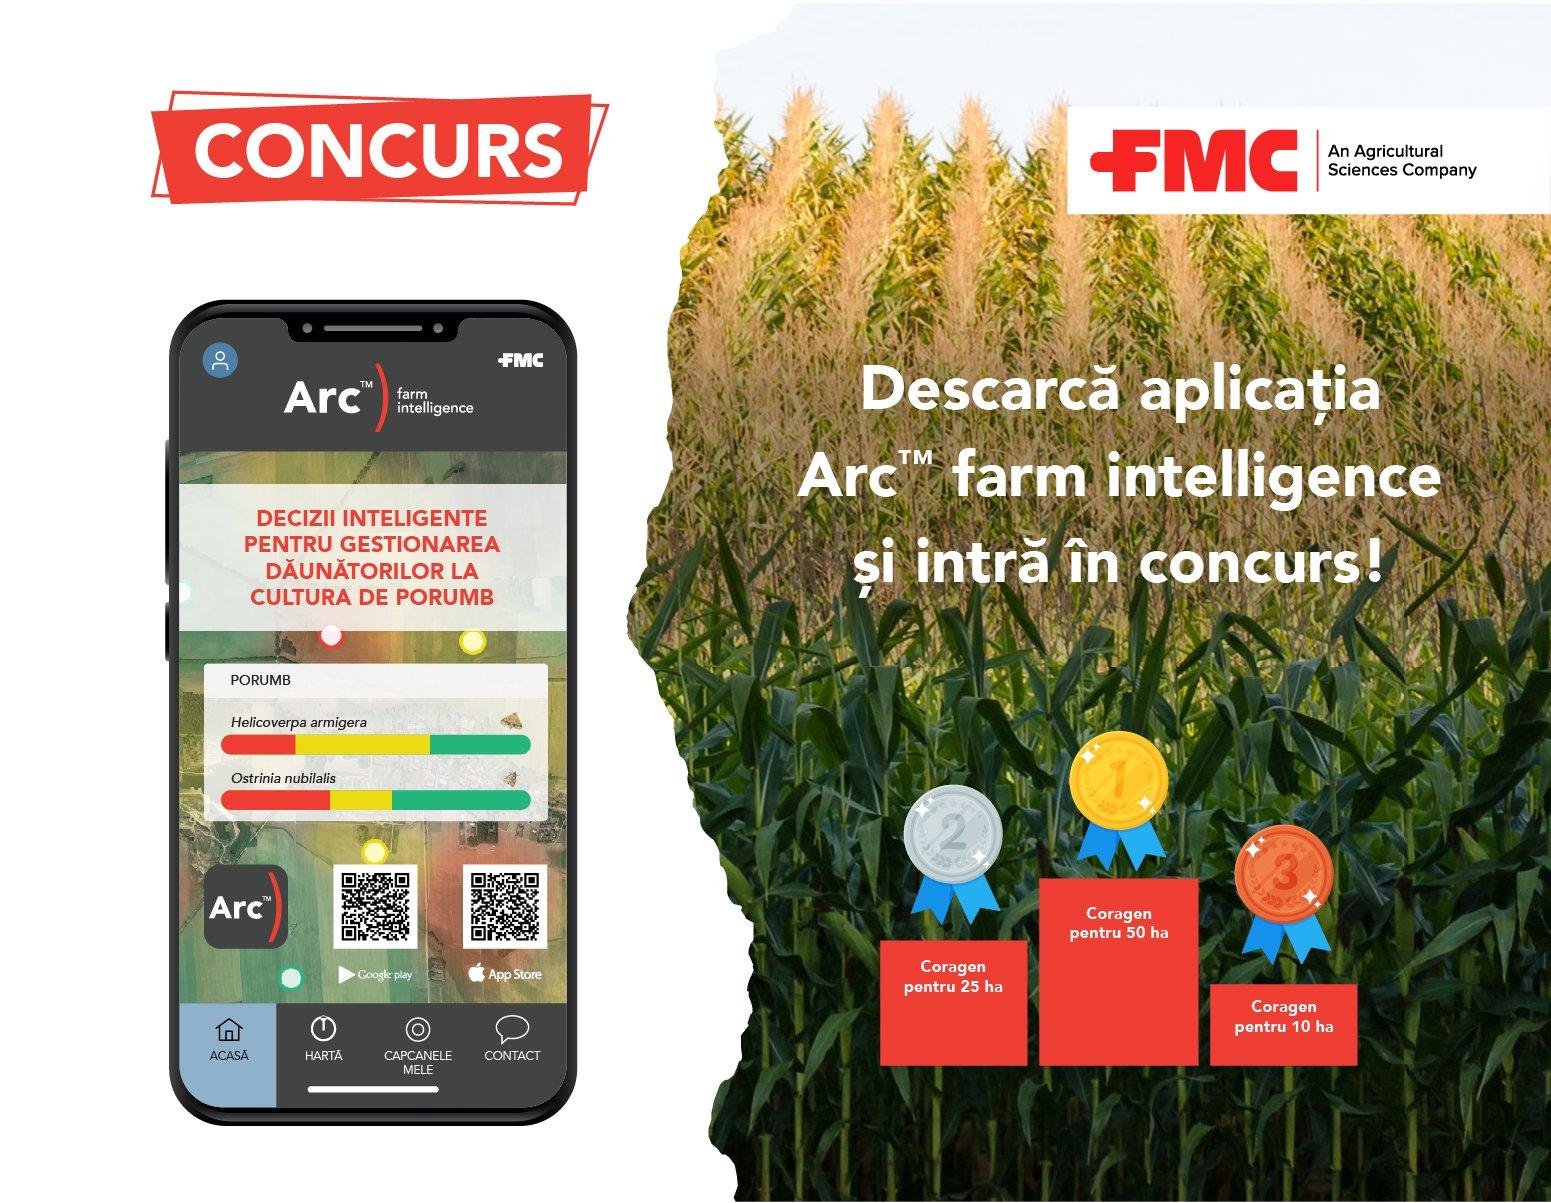 Concurs FMC - website - stire 744x577 px-05.jpg